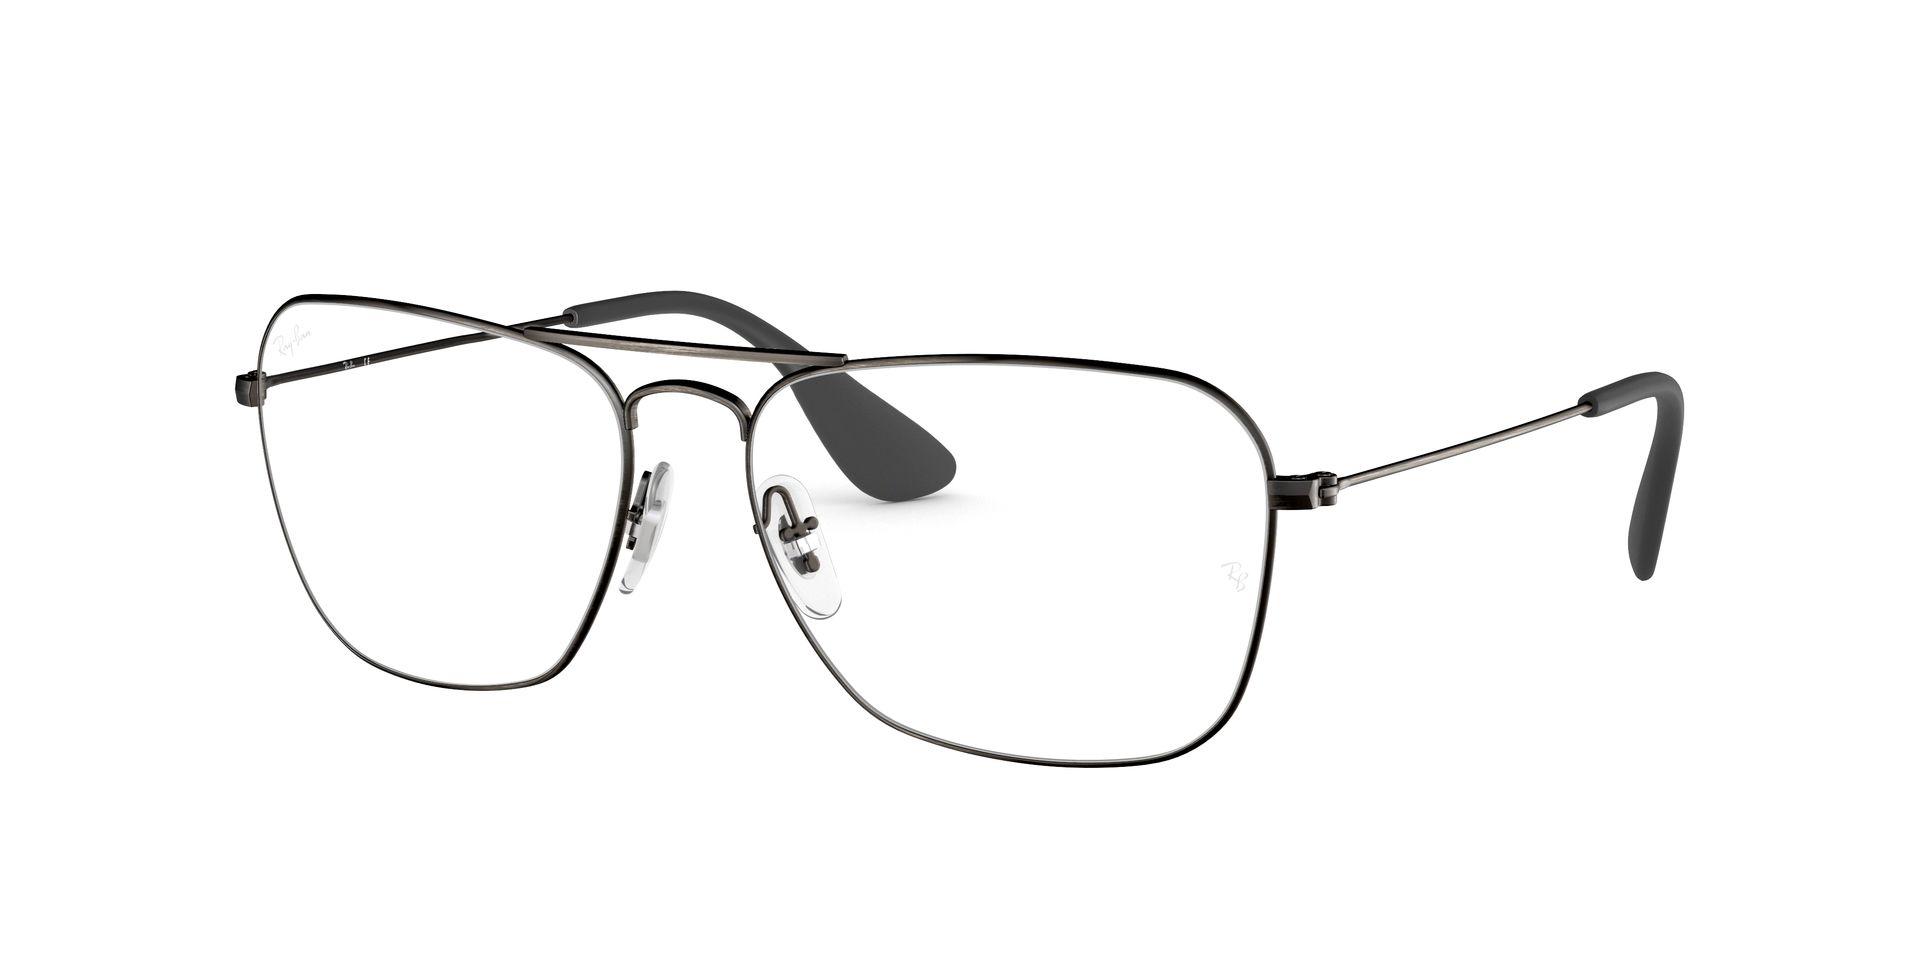 edbf0988610 Ray-Ban RX3610V Eyeglass Frames